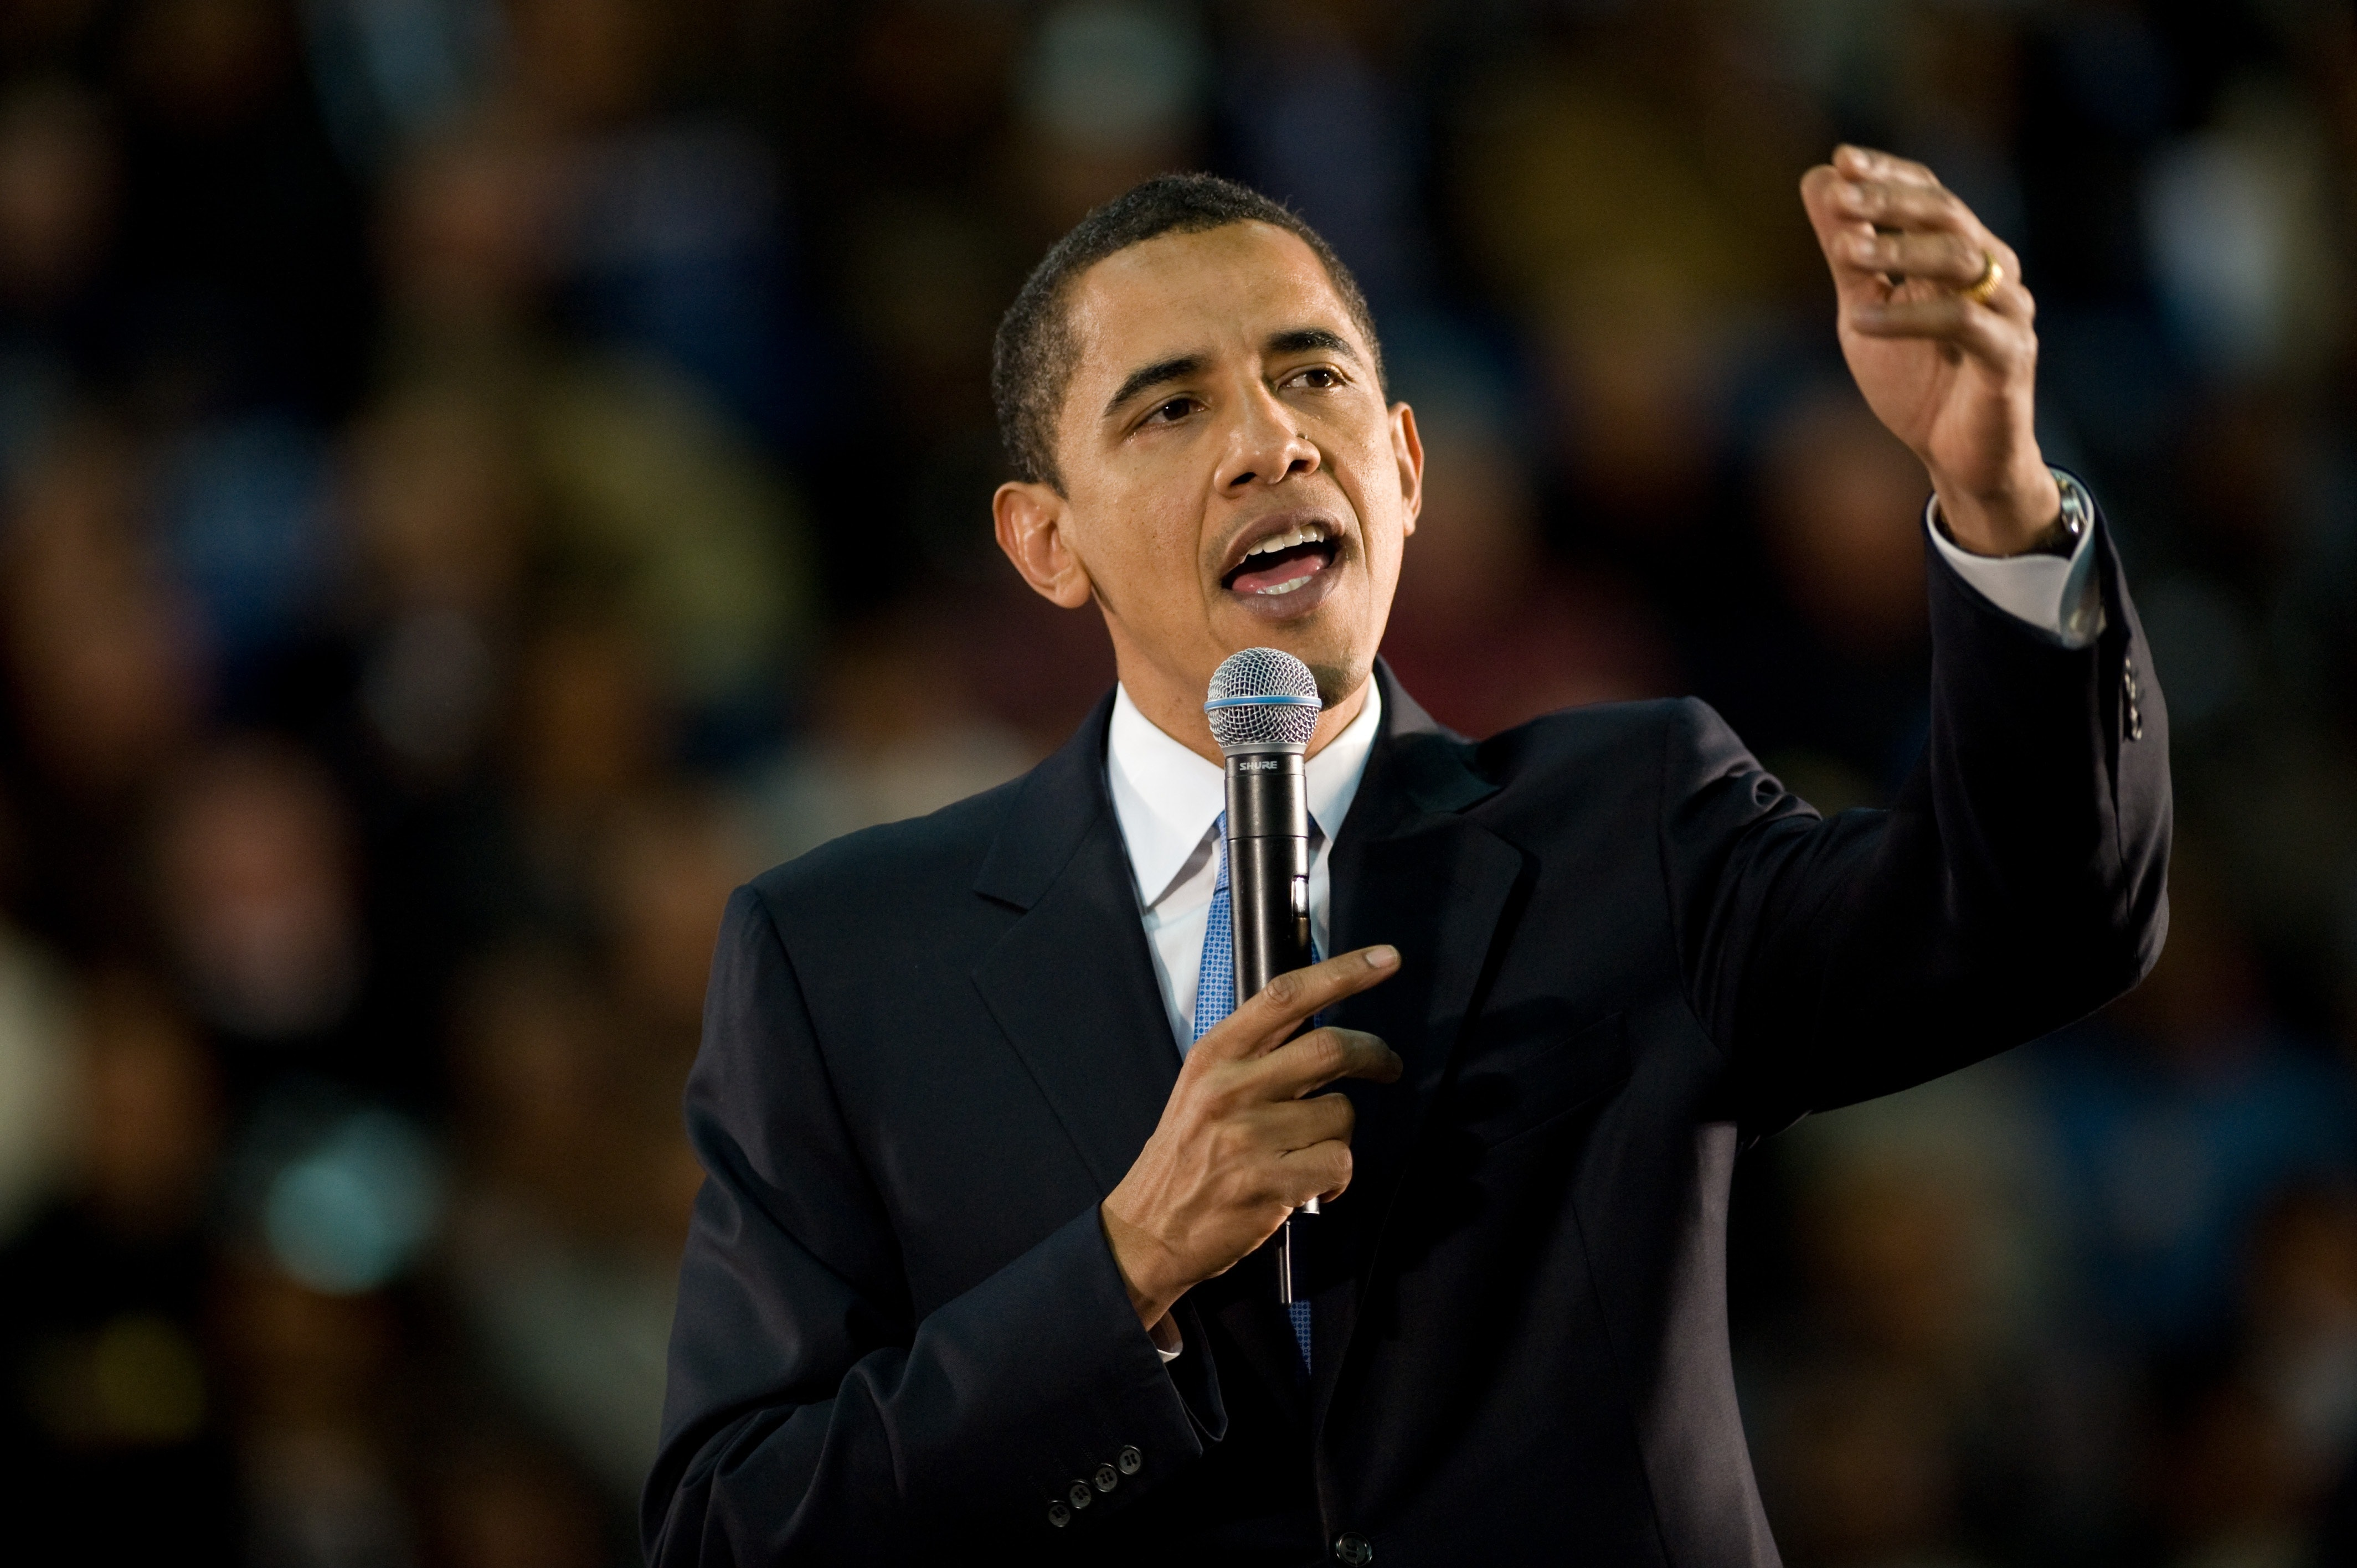 Obama ledde